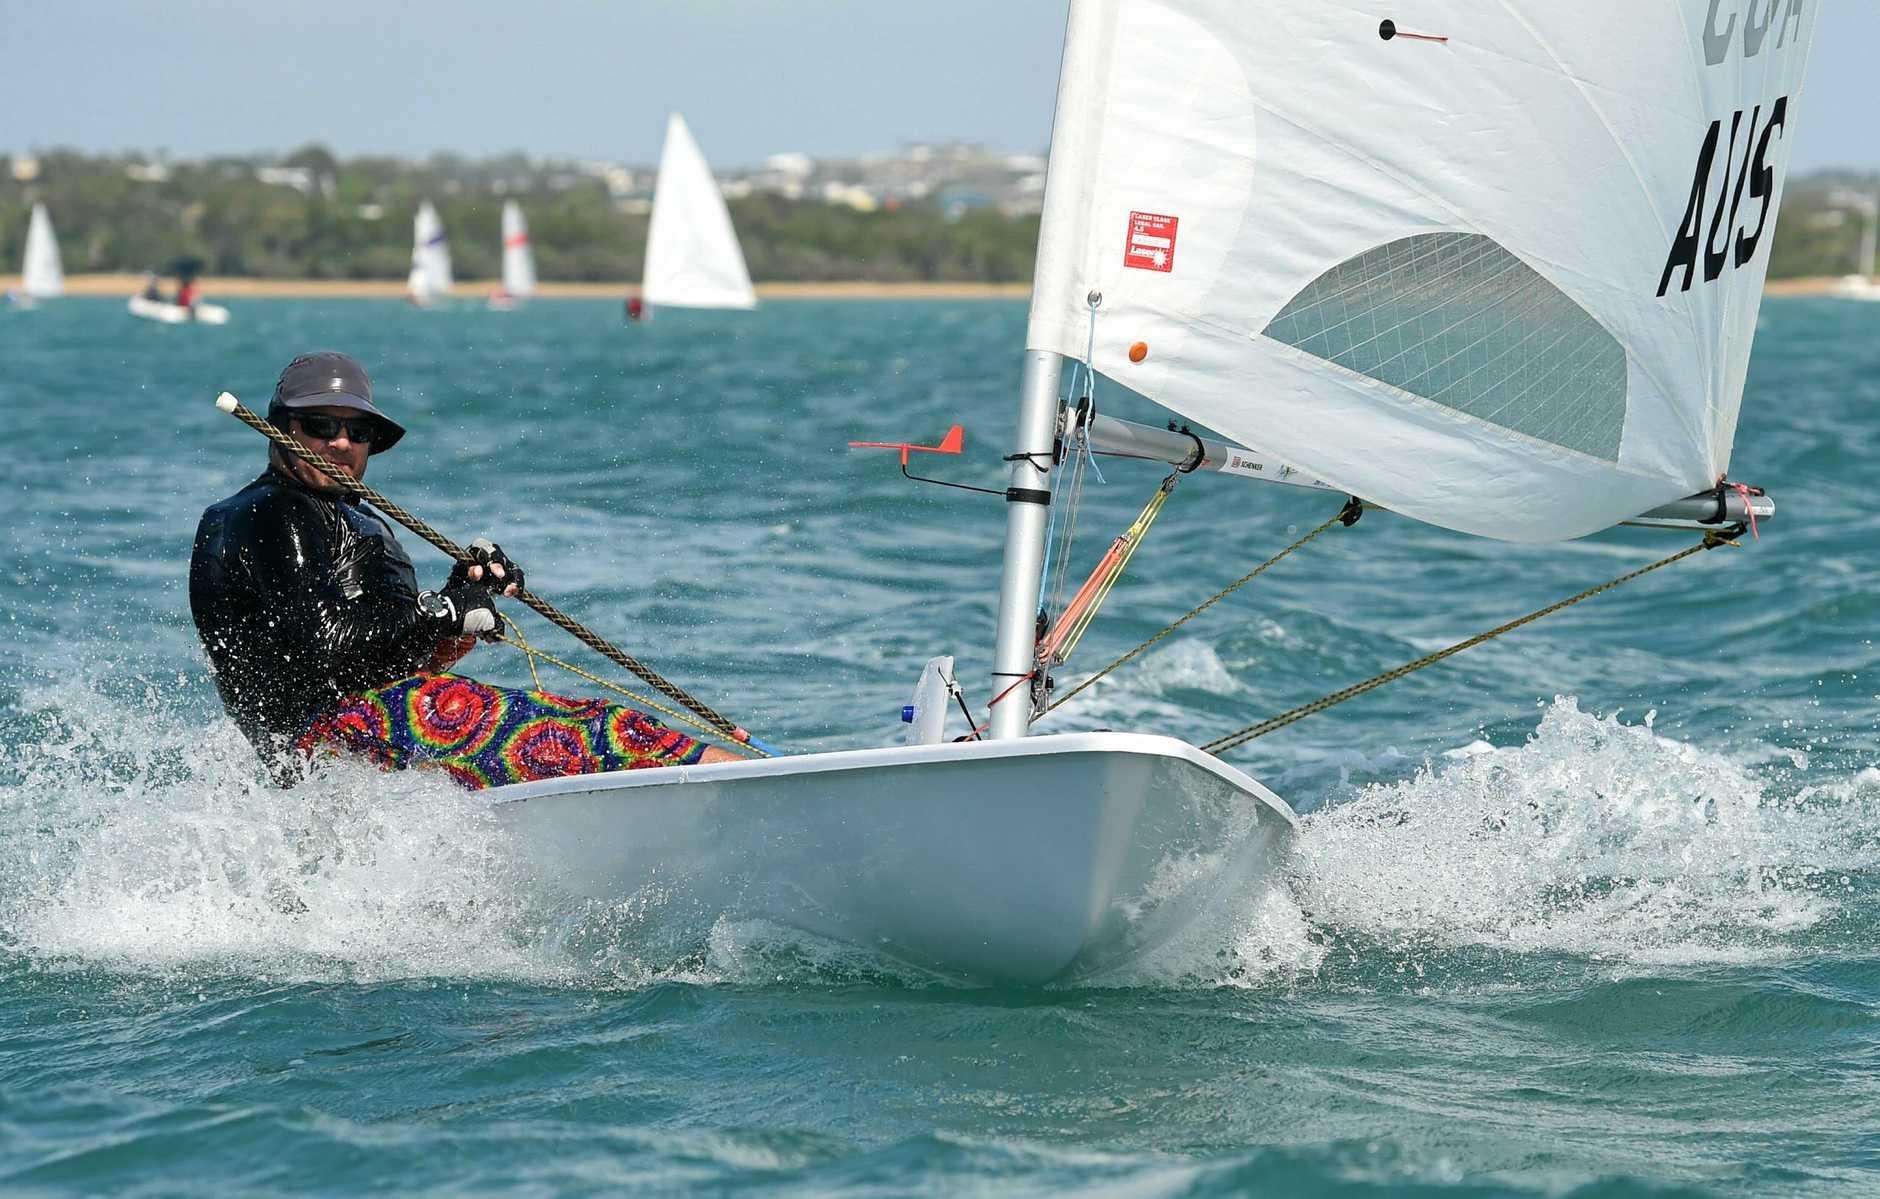 Maryborough Sailing Club 88th Easter Regatta - Chris Barnes on his Laser